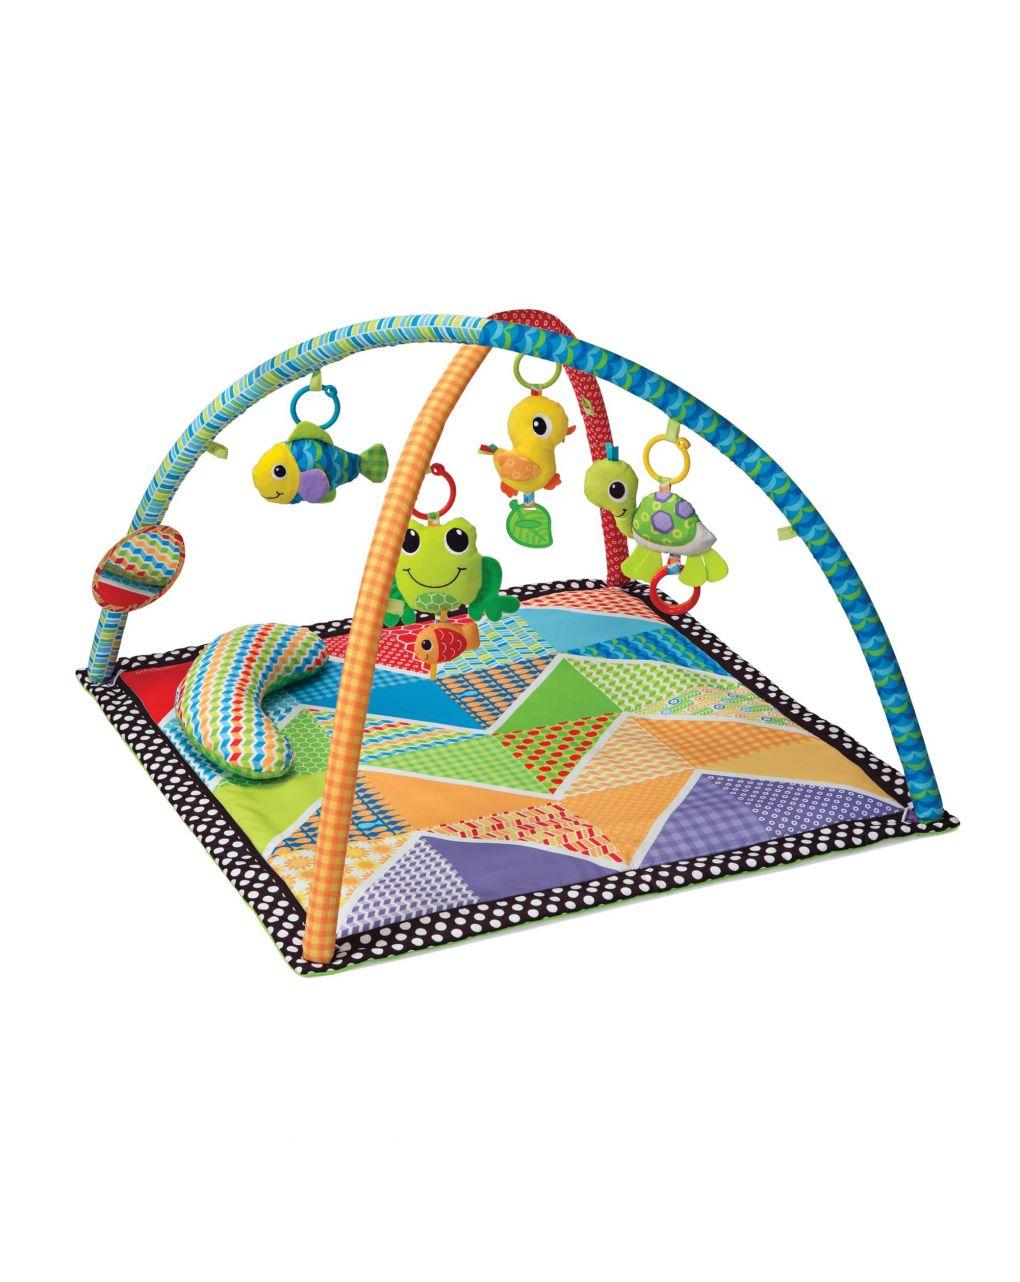 Infantino - palestrina e tappeto gioco - Infantino